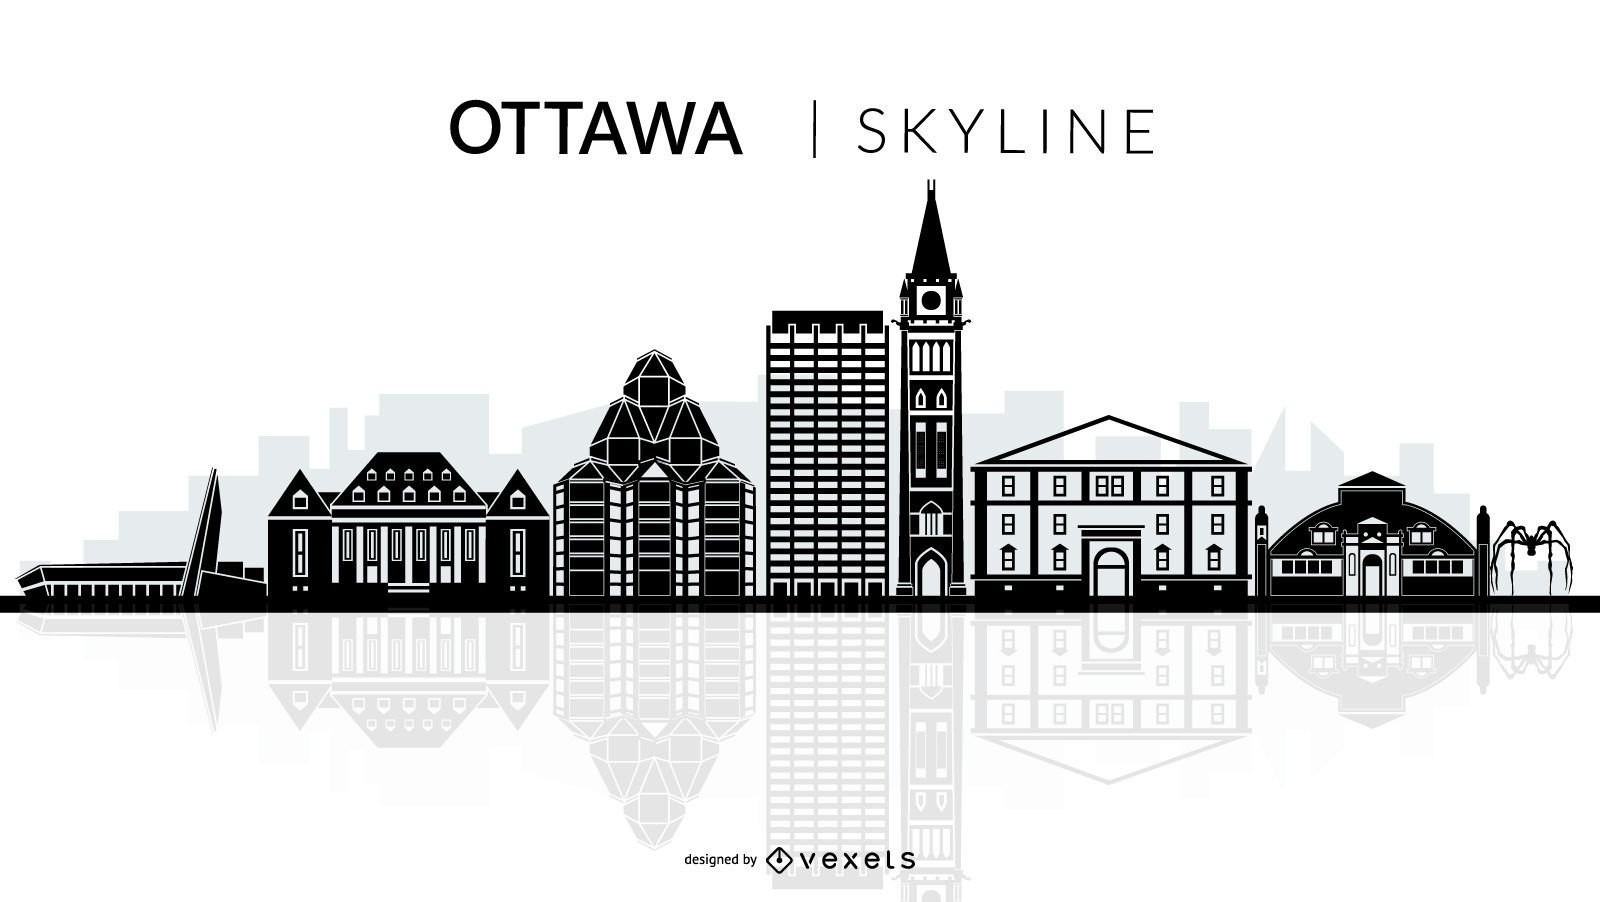 Ottawa skyline silhouette